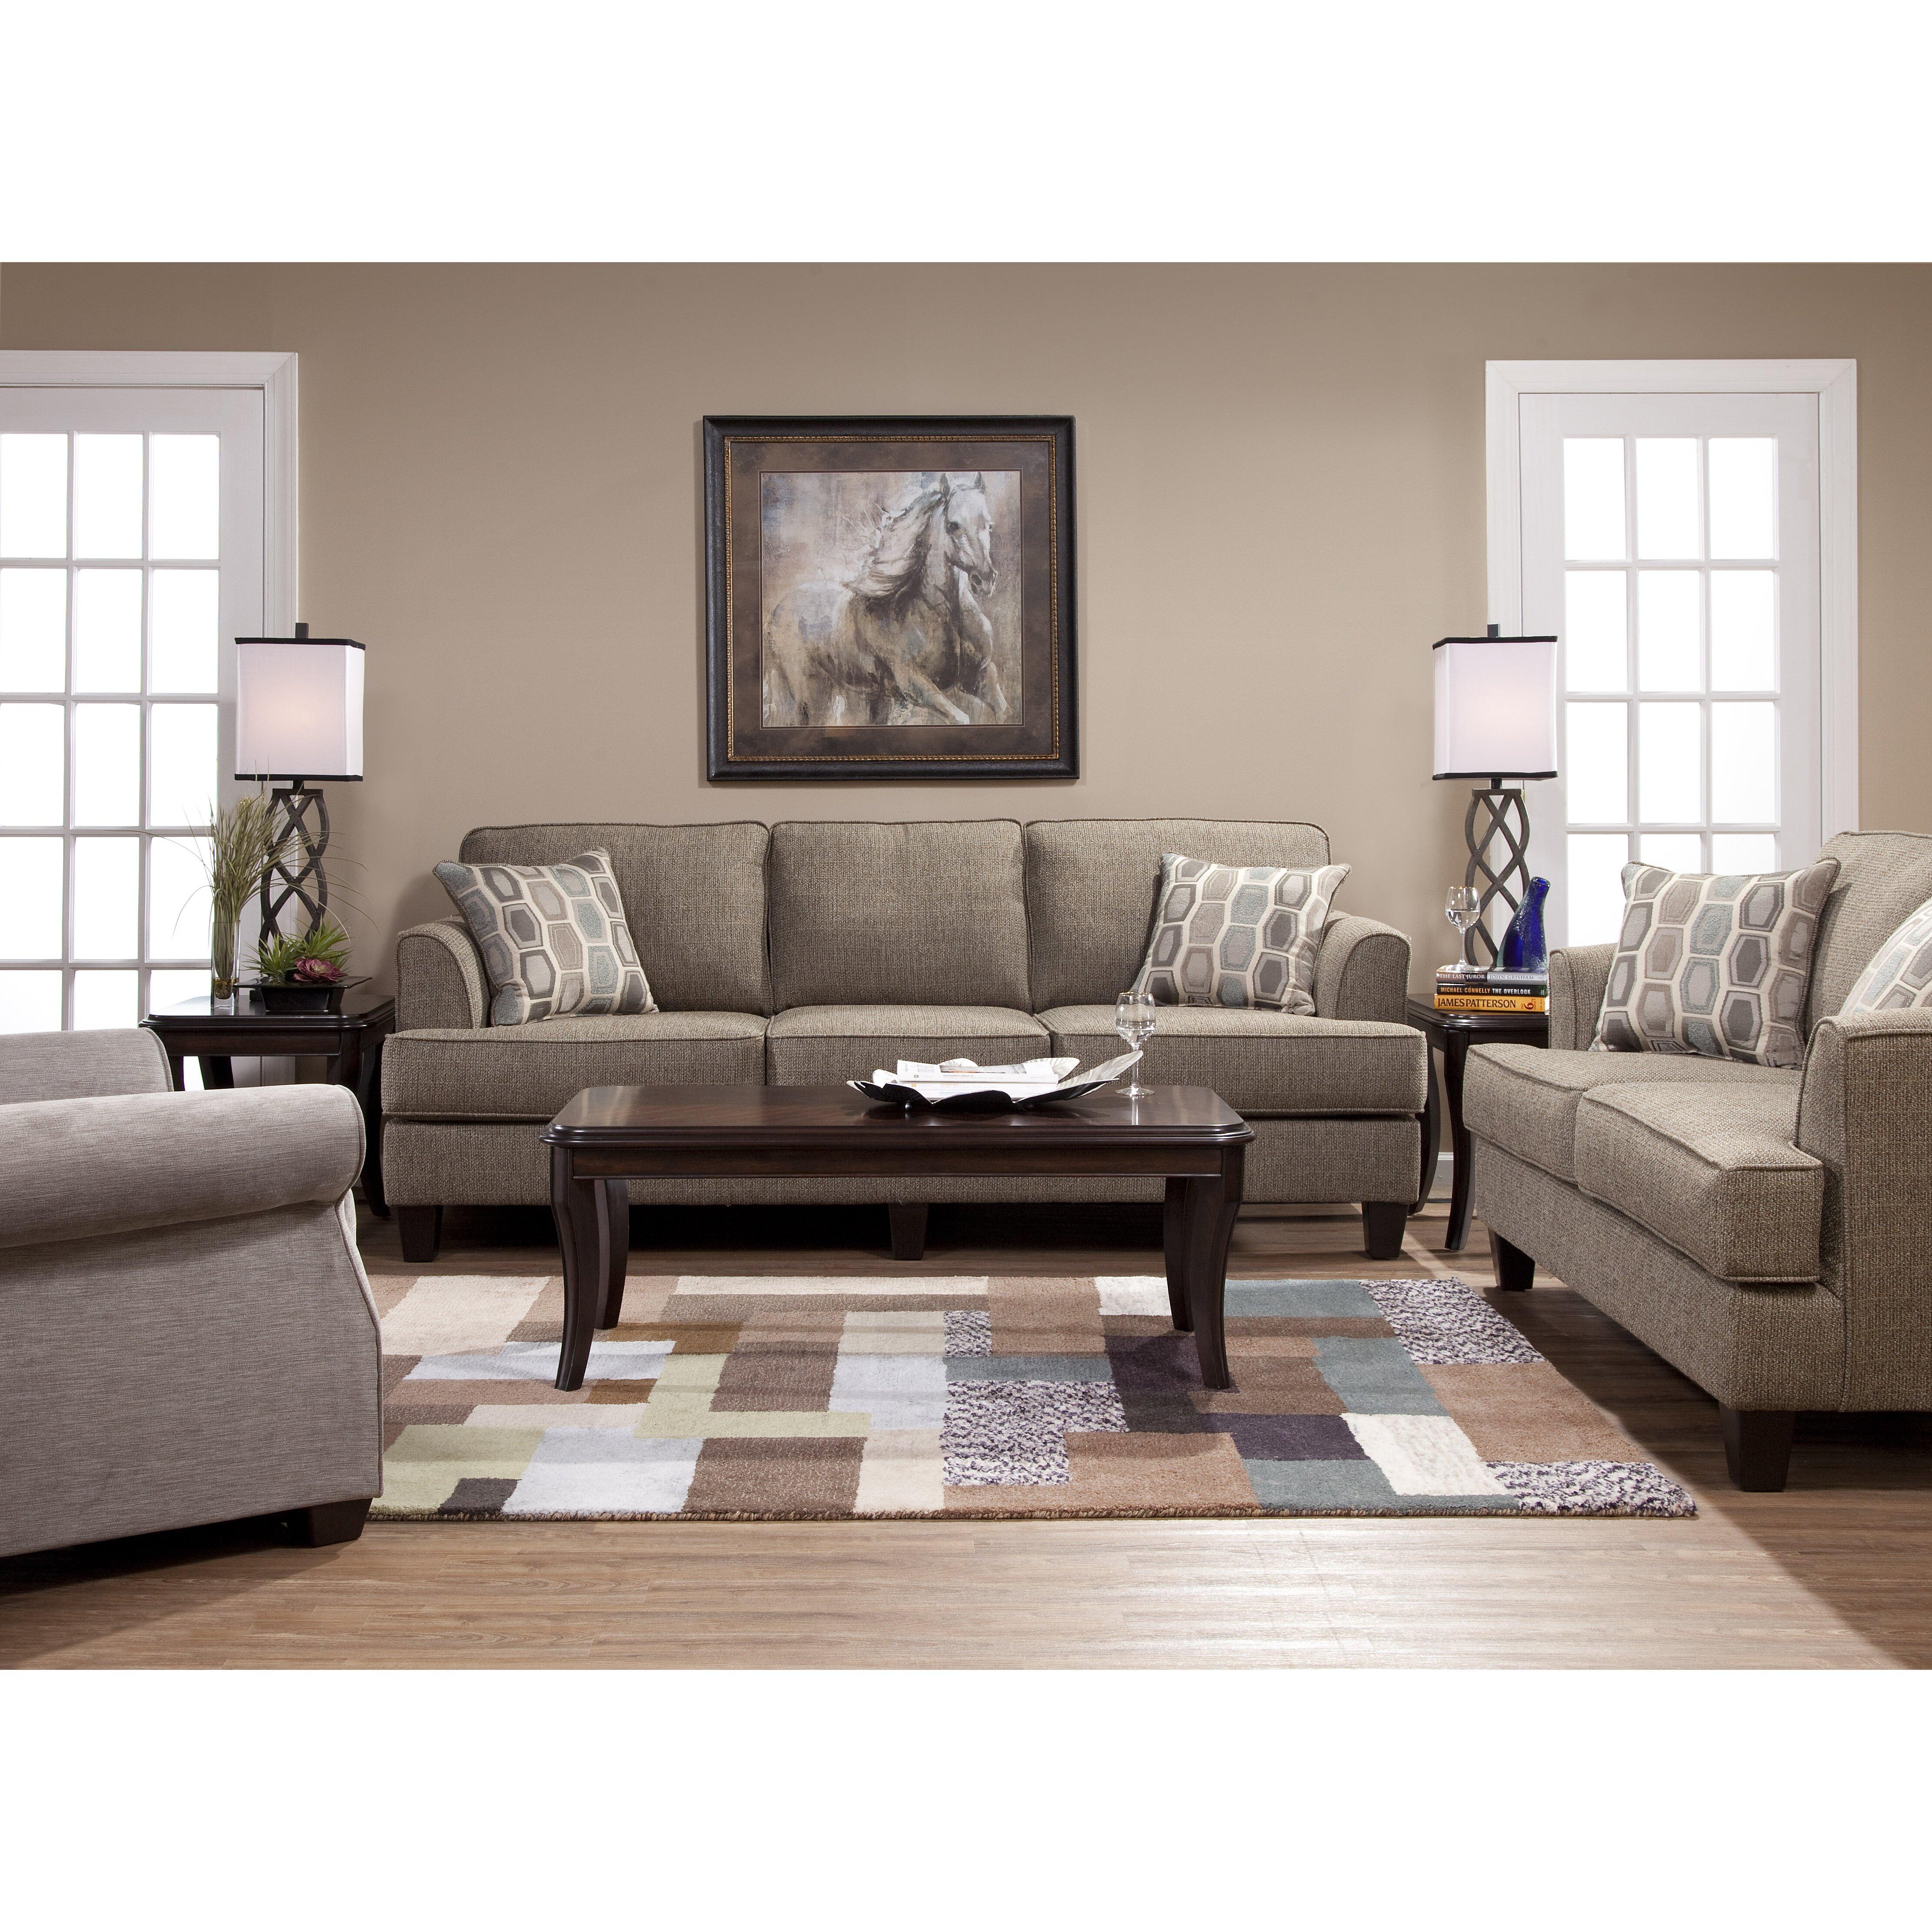 Red Barrel Studio Serta Upholstery Dallas Sofa Reviews